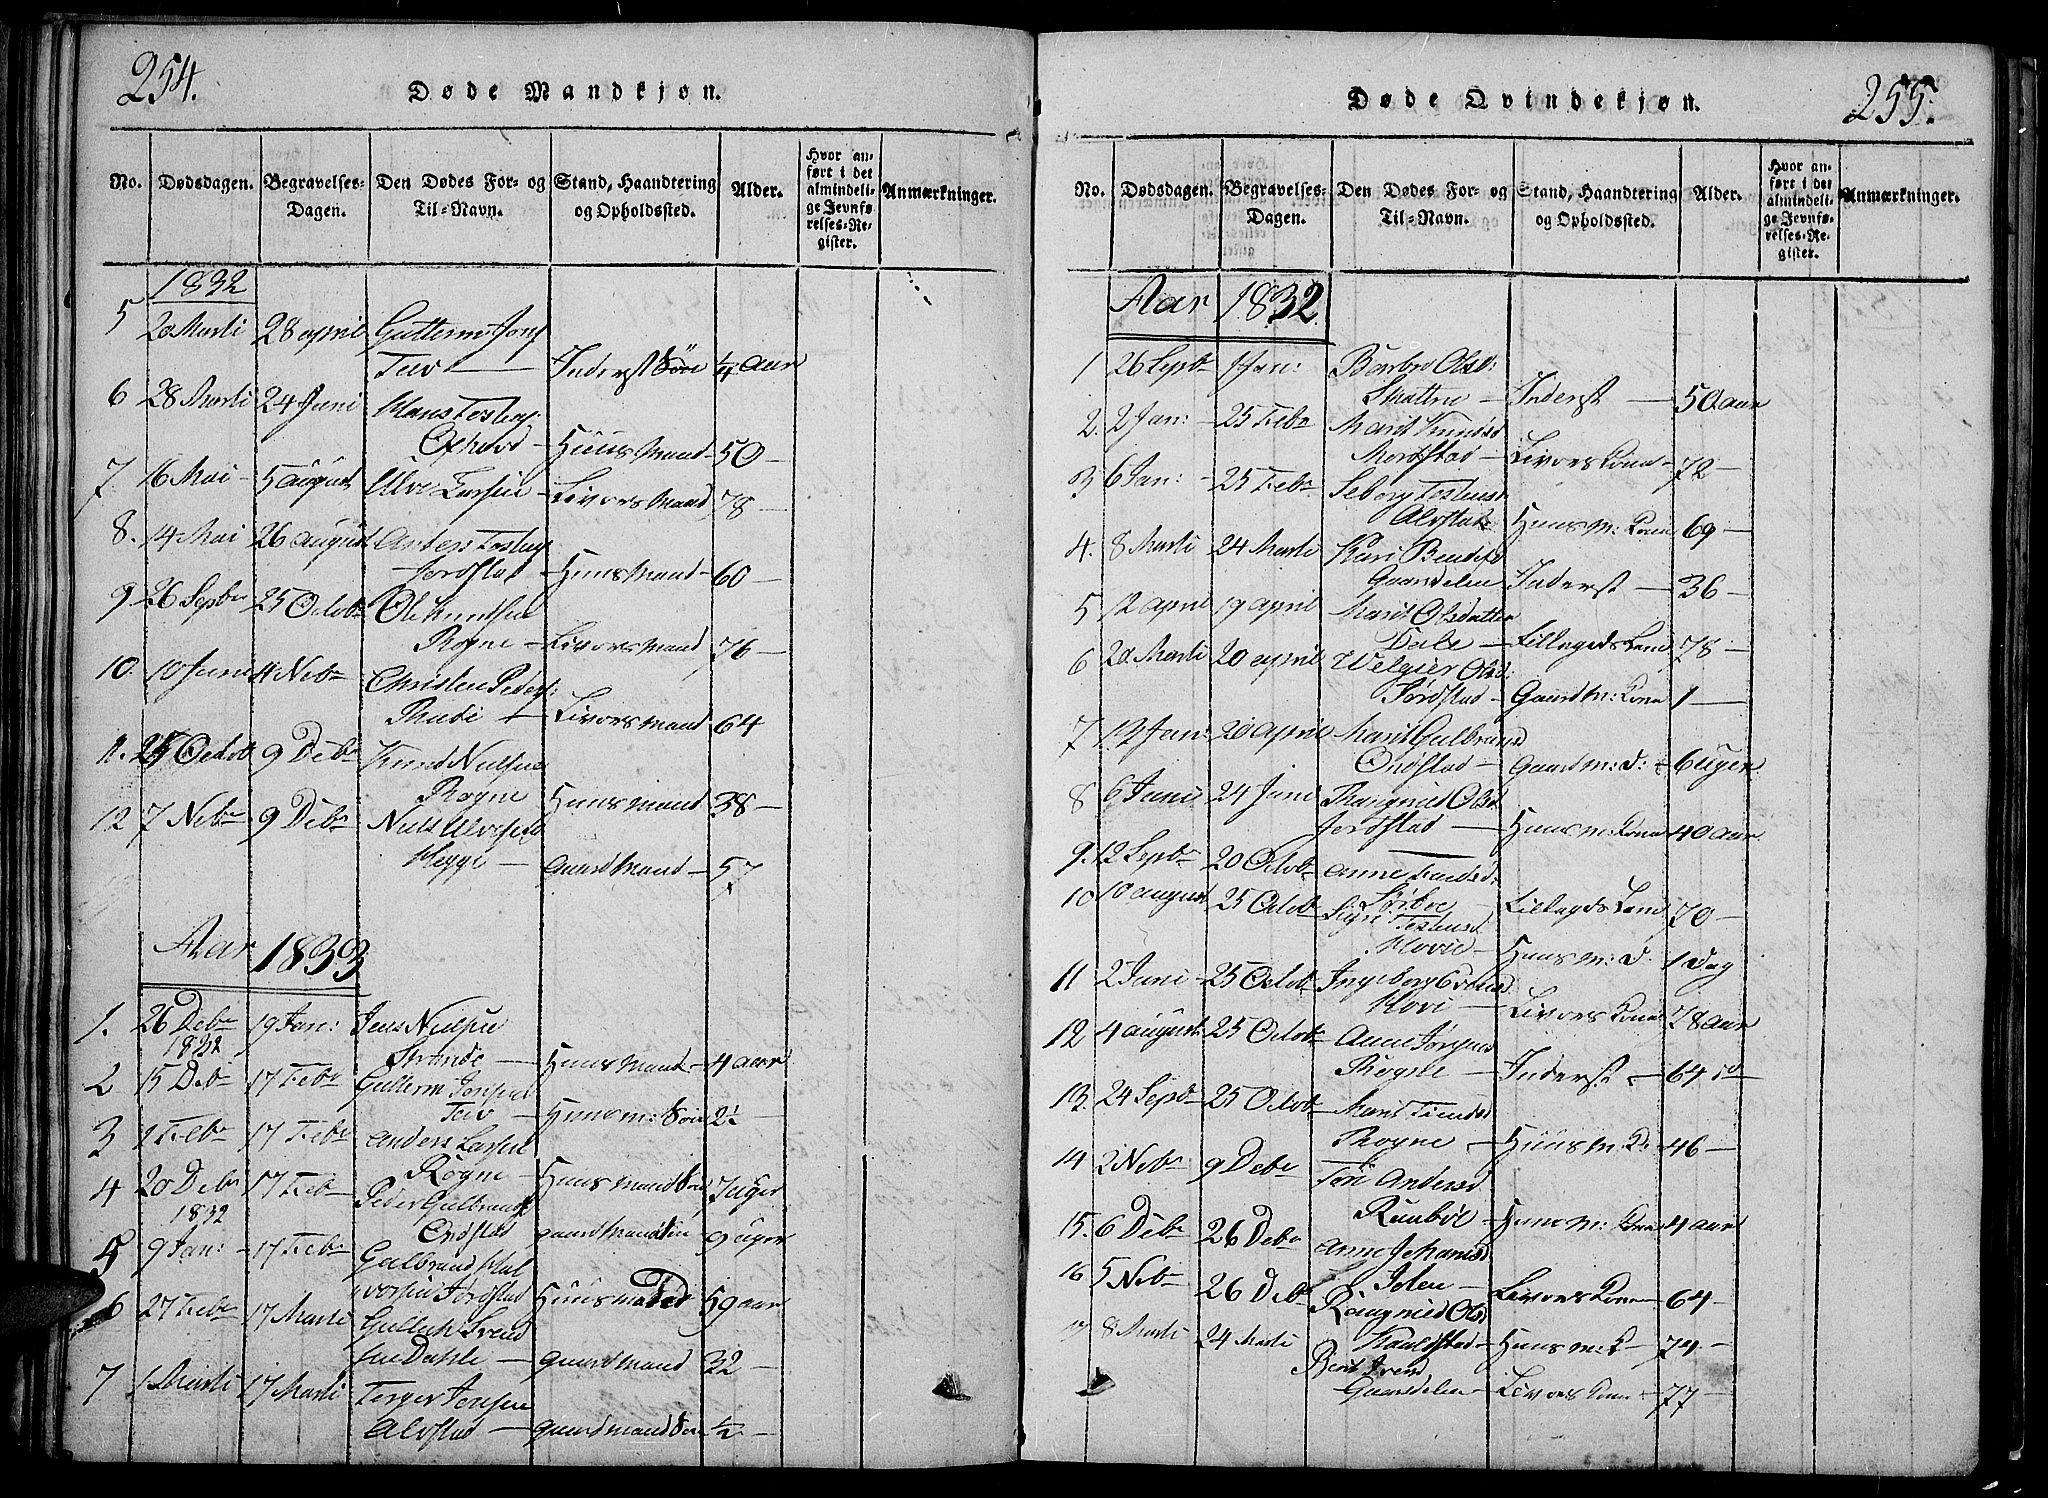 SAH, Slidre prestekontor, Klokkerbok nr. 2, 1814-1839, s. 254-255